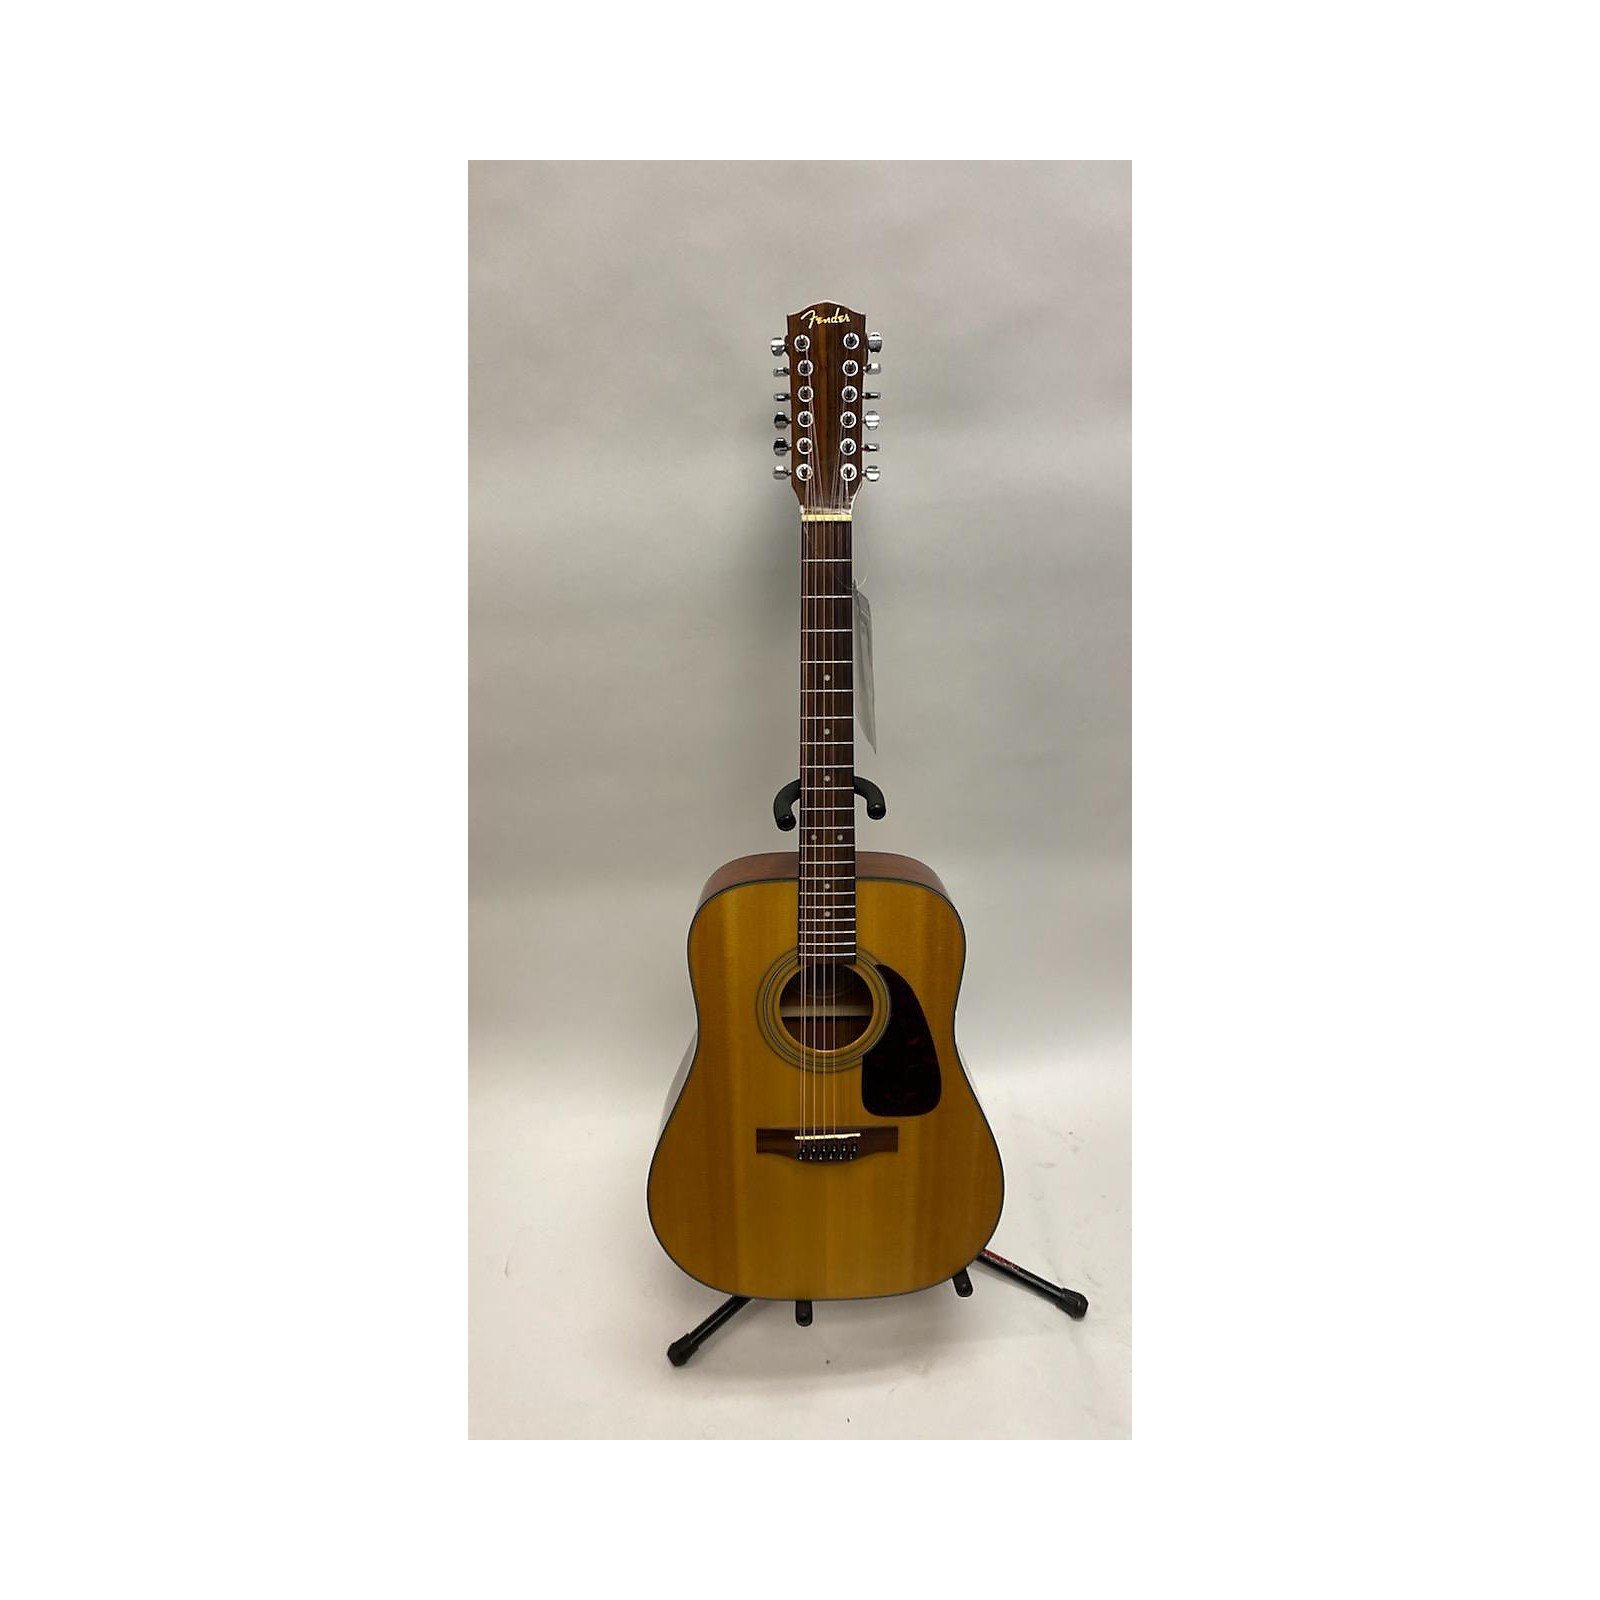 Fender DG14S-12 12 String Acoustic Guitar